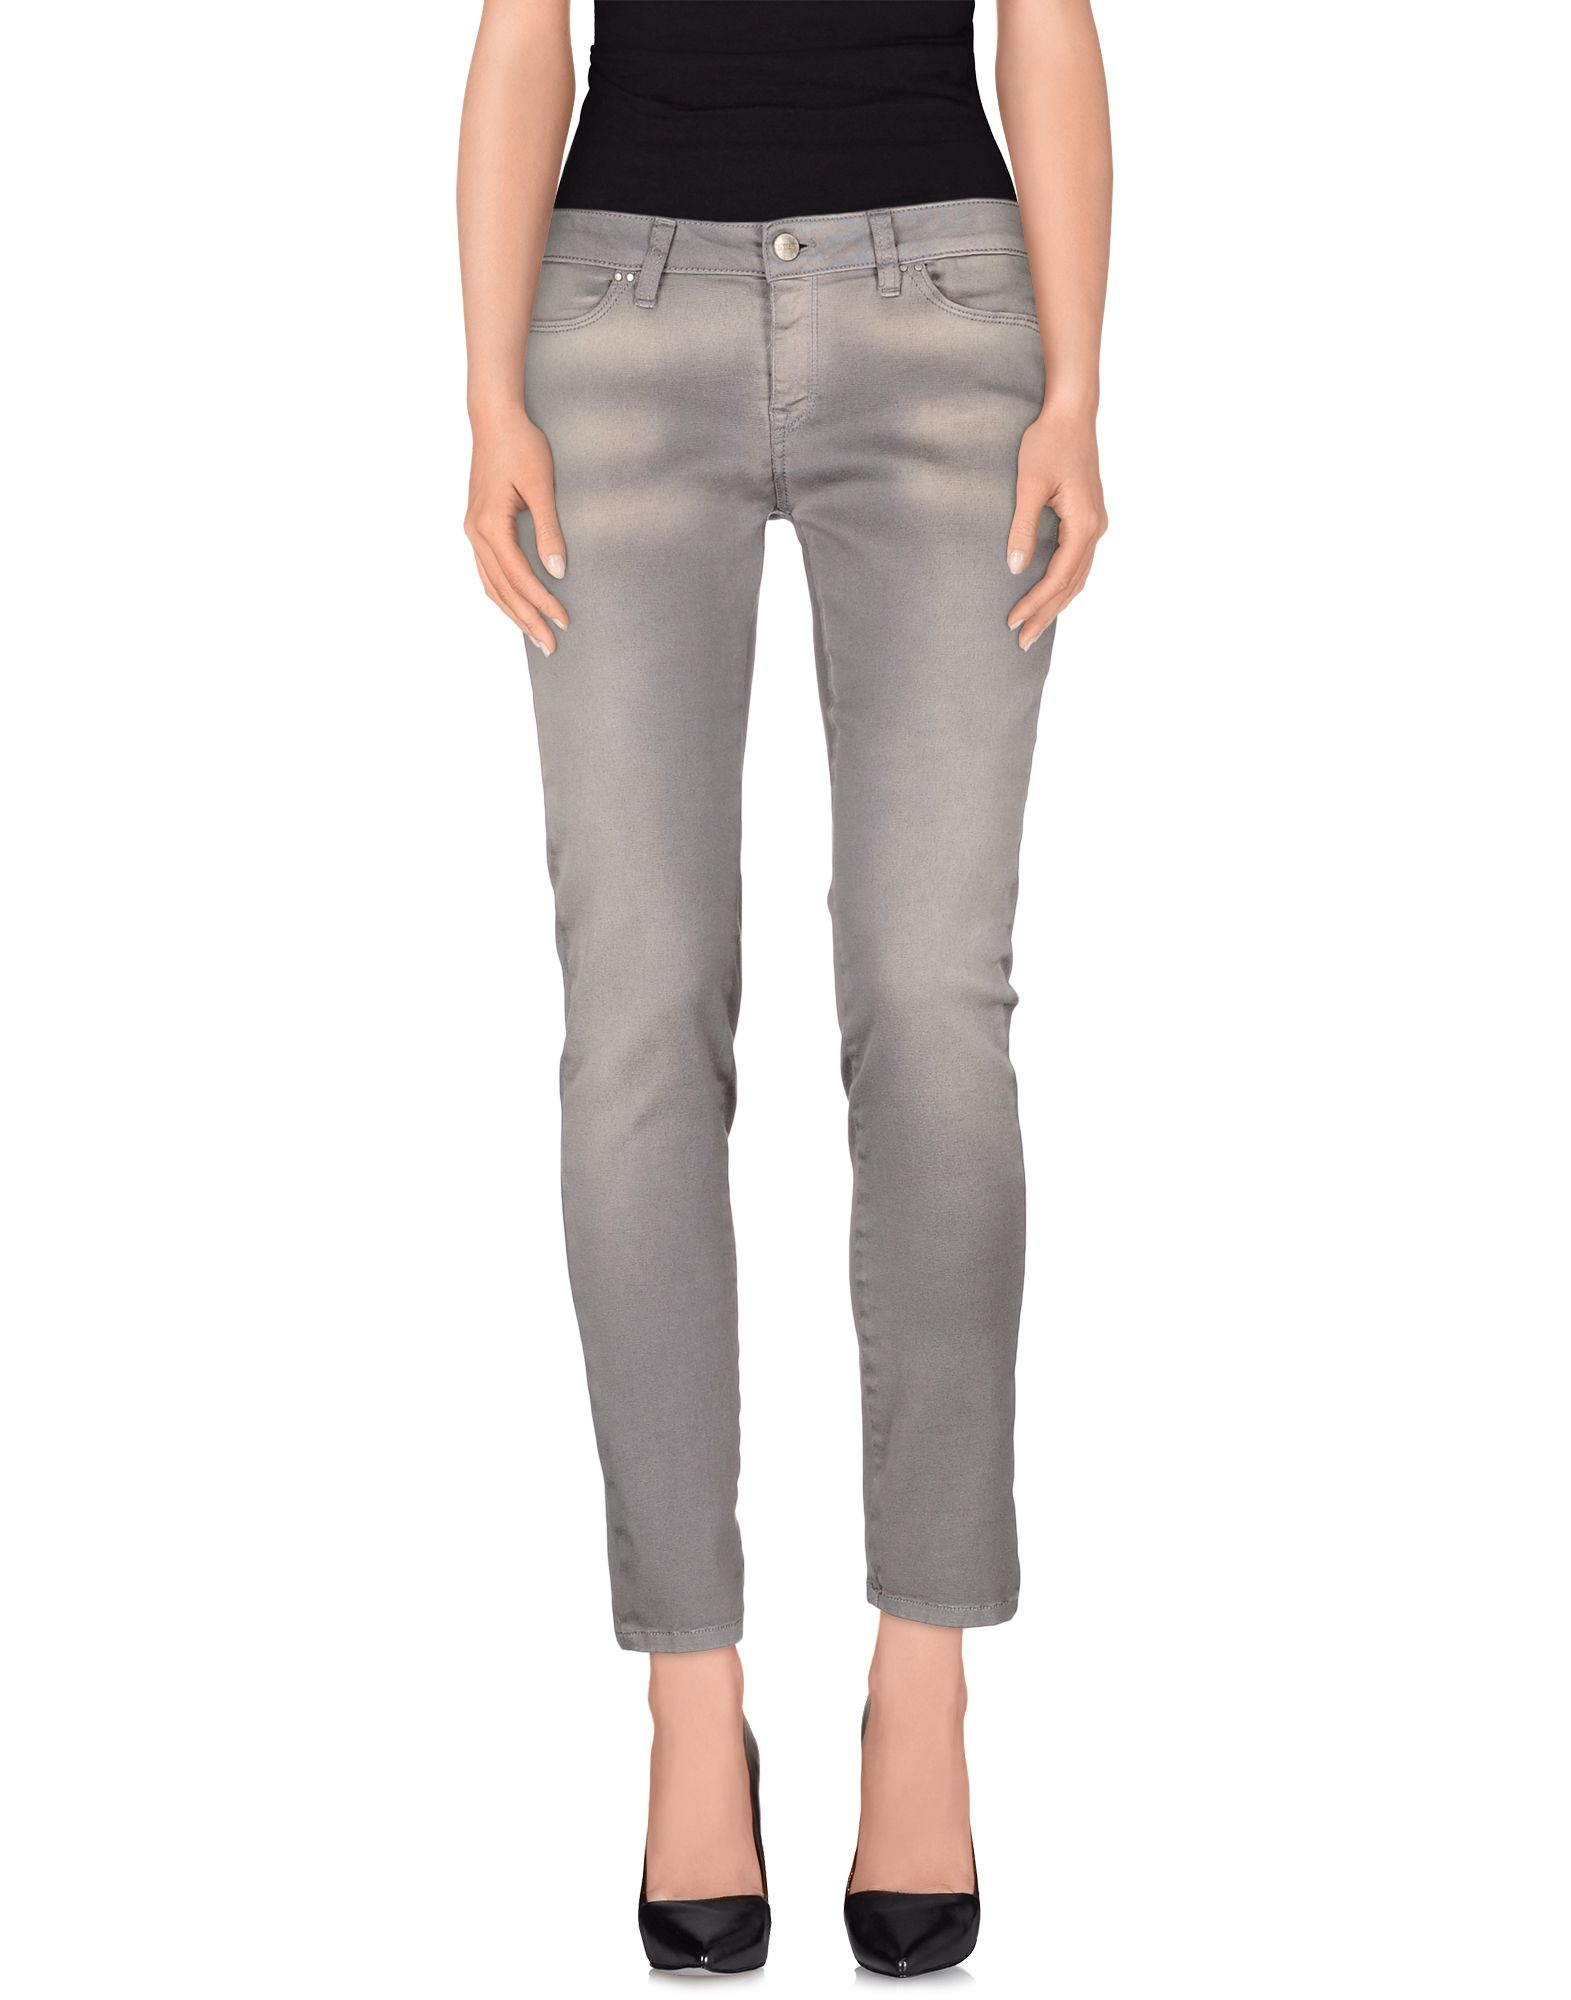 'HI-TOUCH Jeans